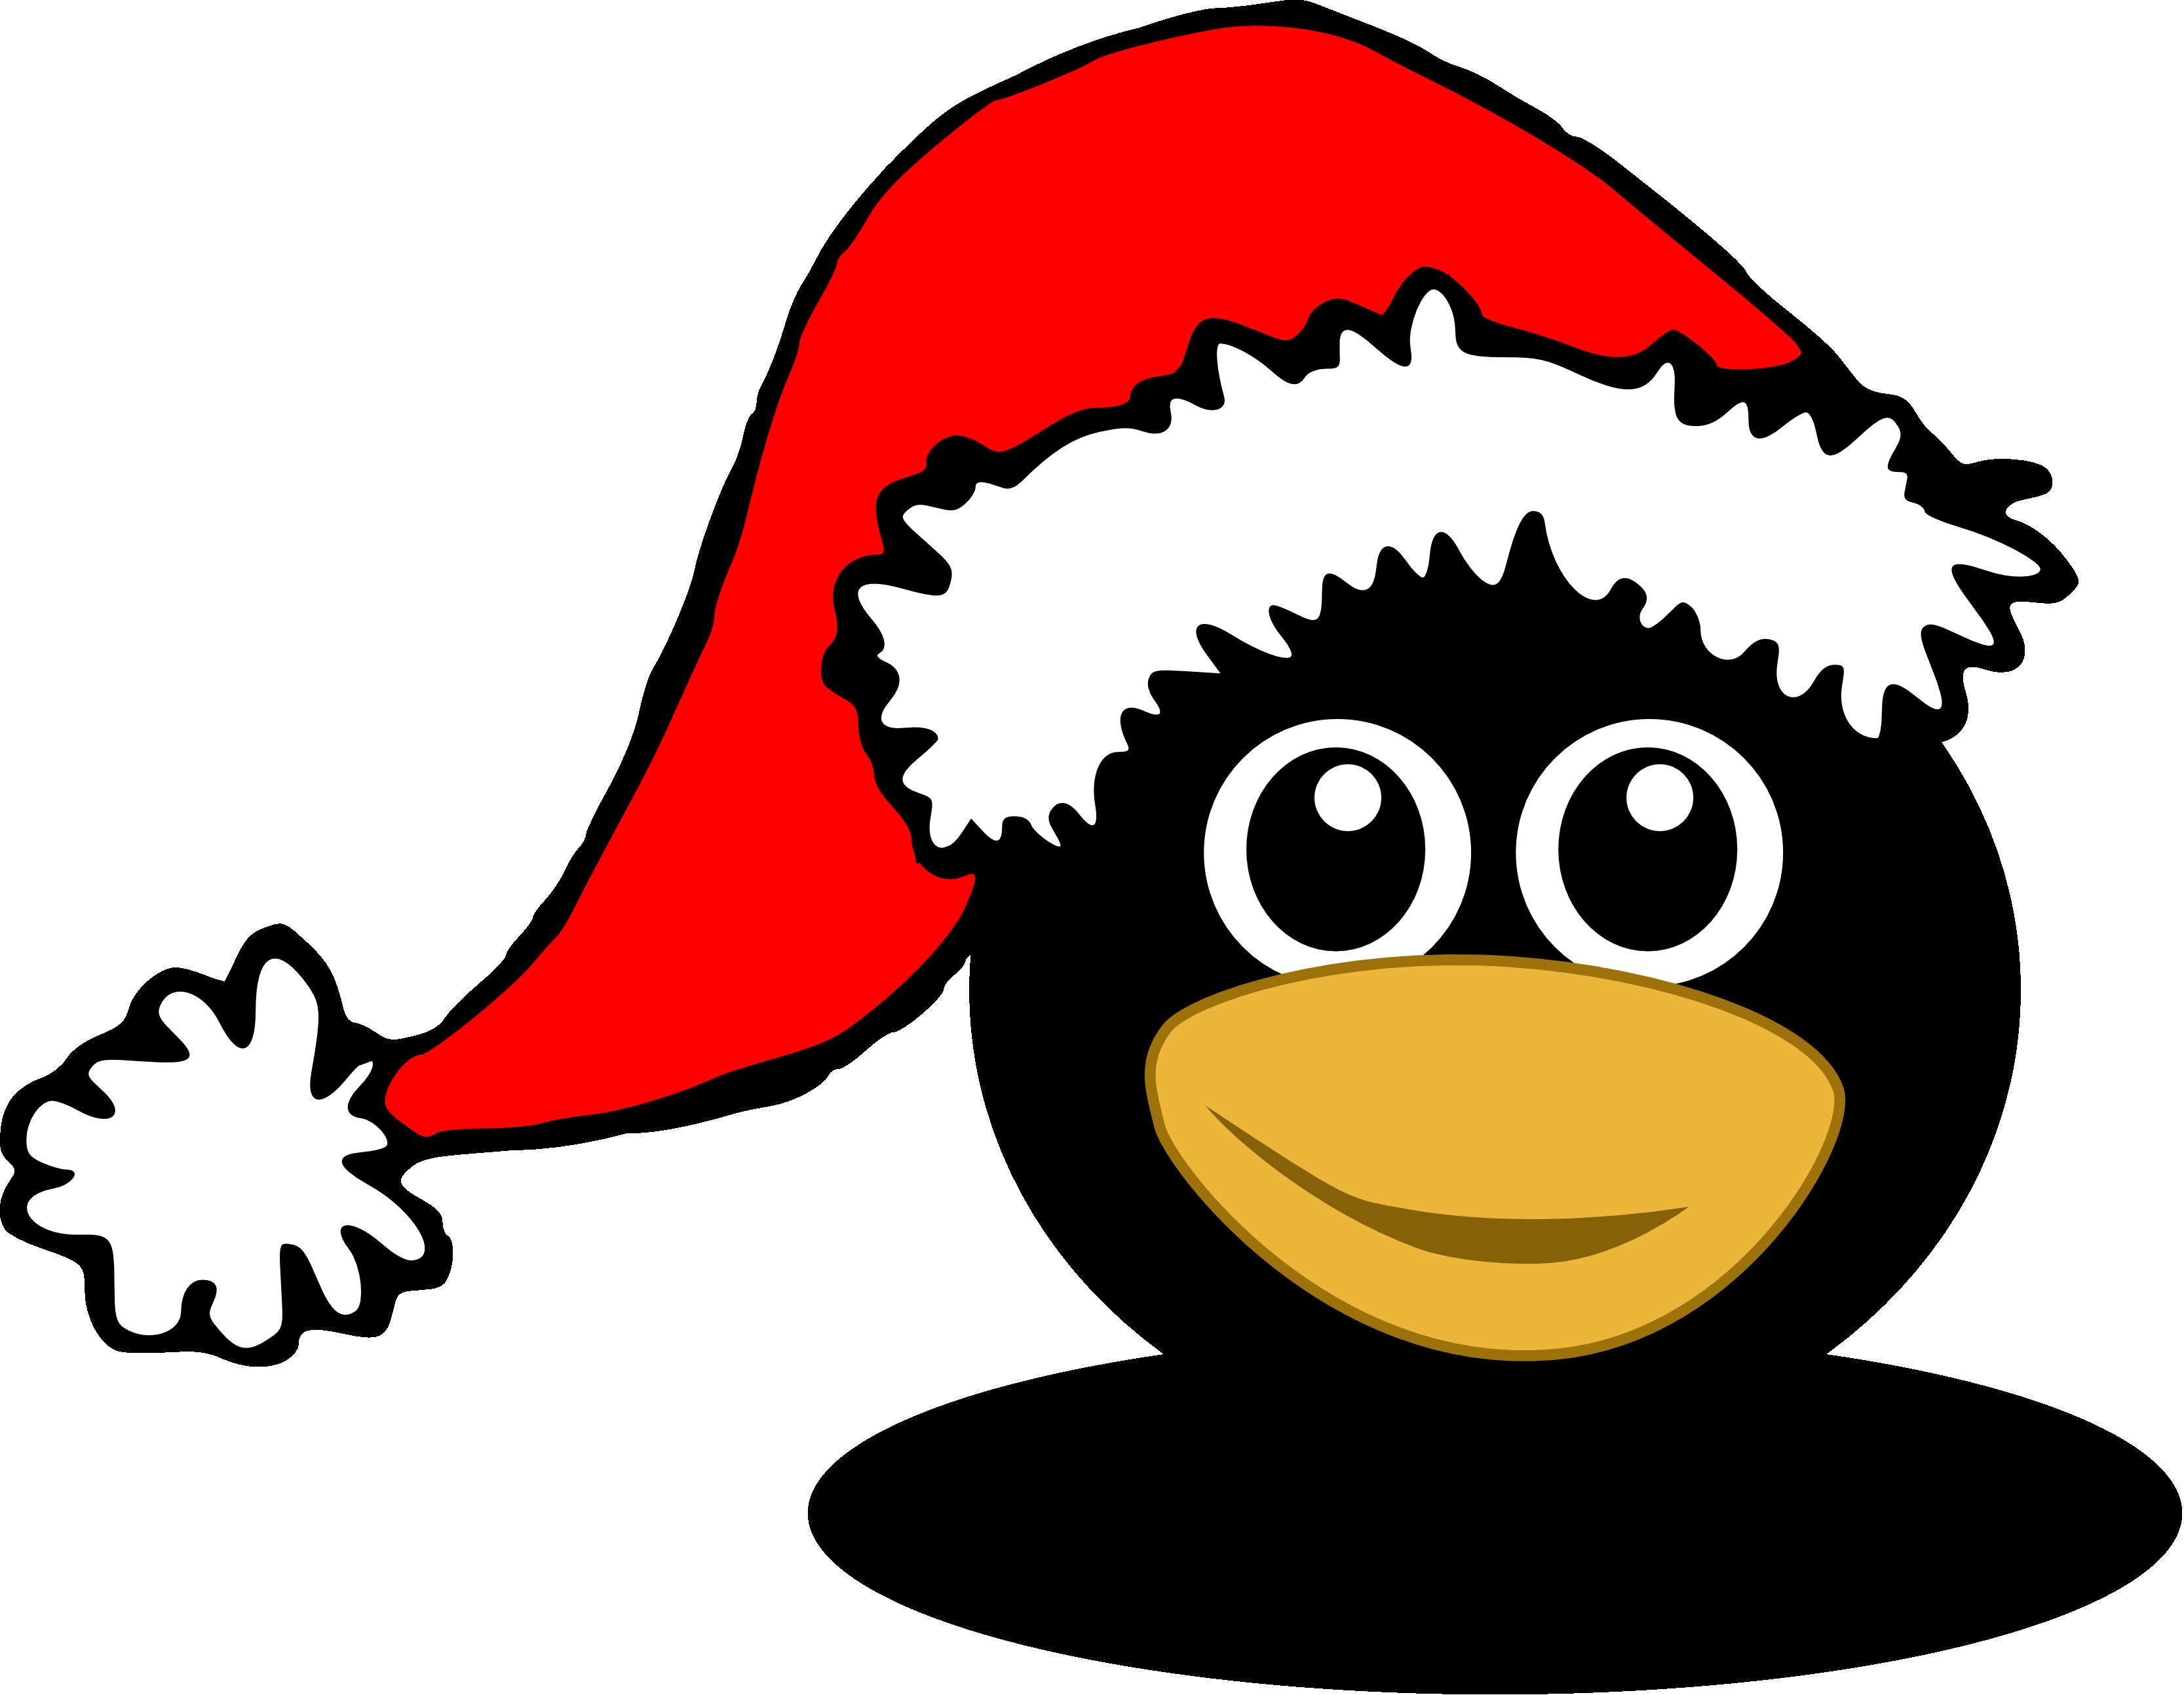 christmas%20penguin%20clipart%20black%20and%20white